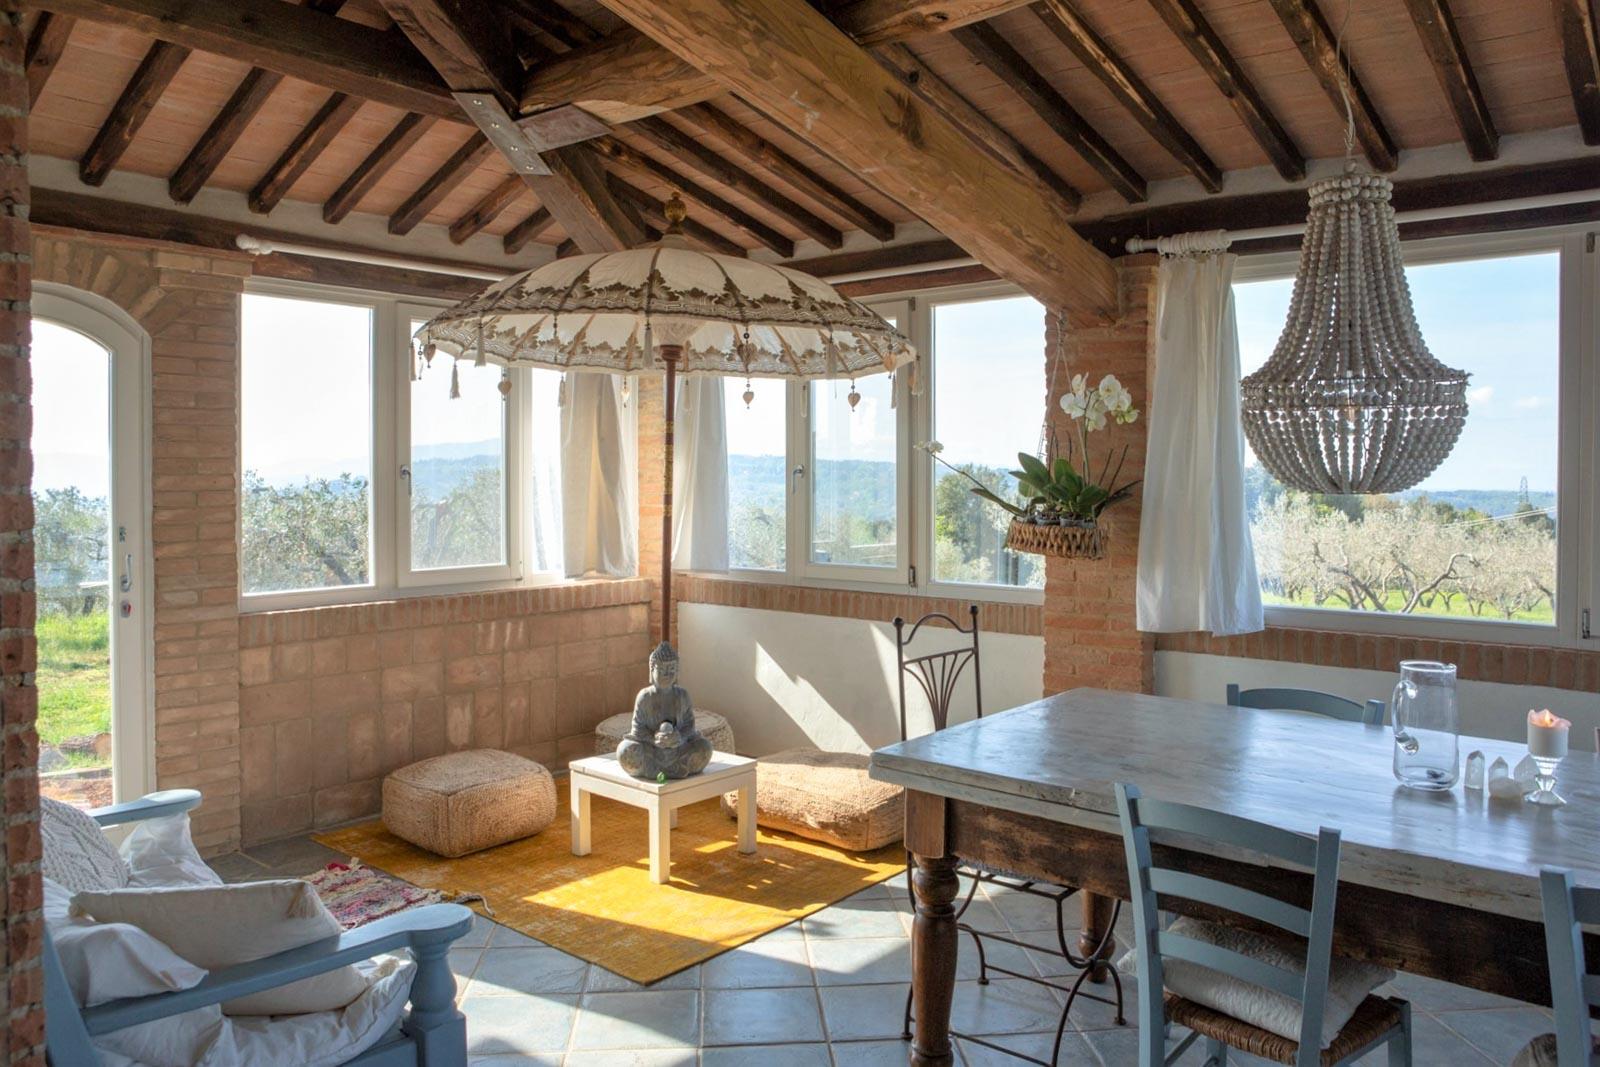 Schmuckes Haus mit Veranda und Meerblick bei Riparbella in der Toskana